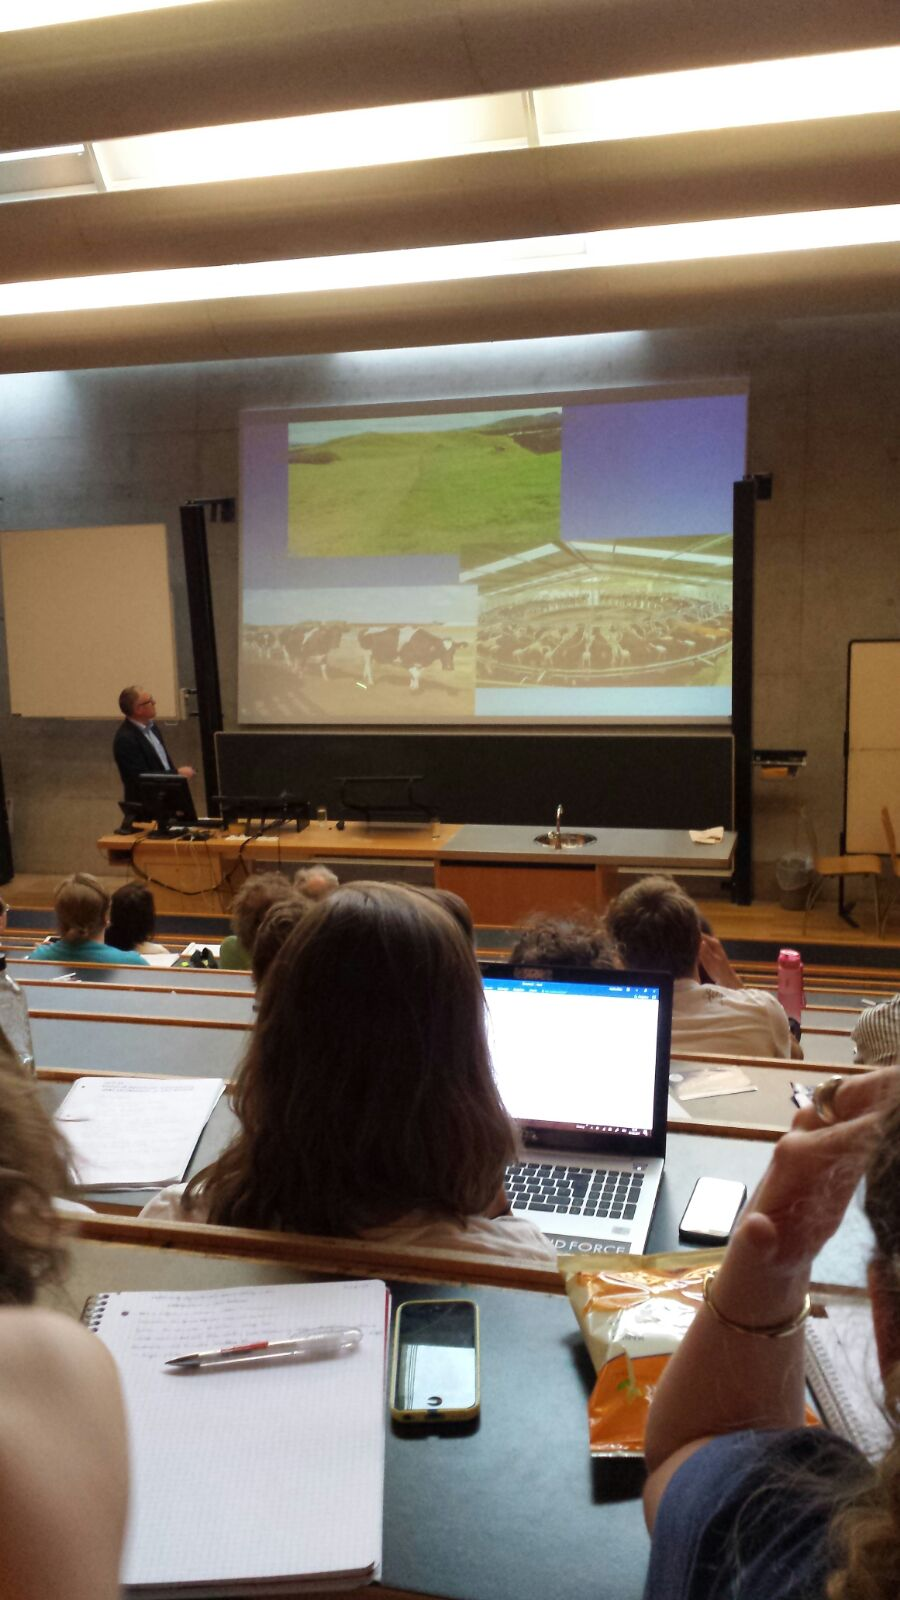 Vortrag zur neoliberalen Transformation des Agrarsektors Neuseelands 1